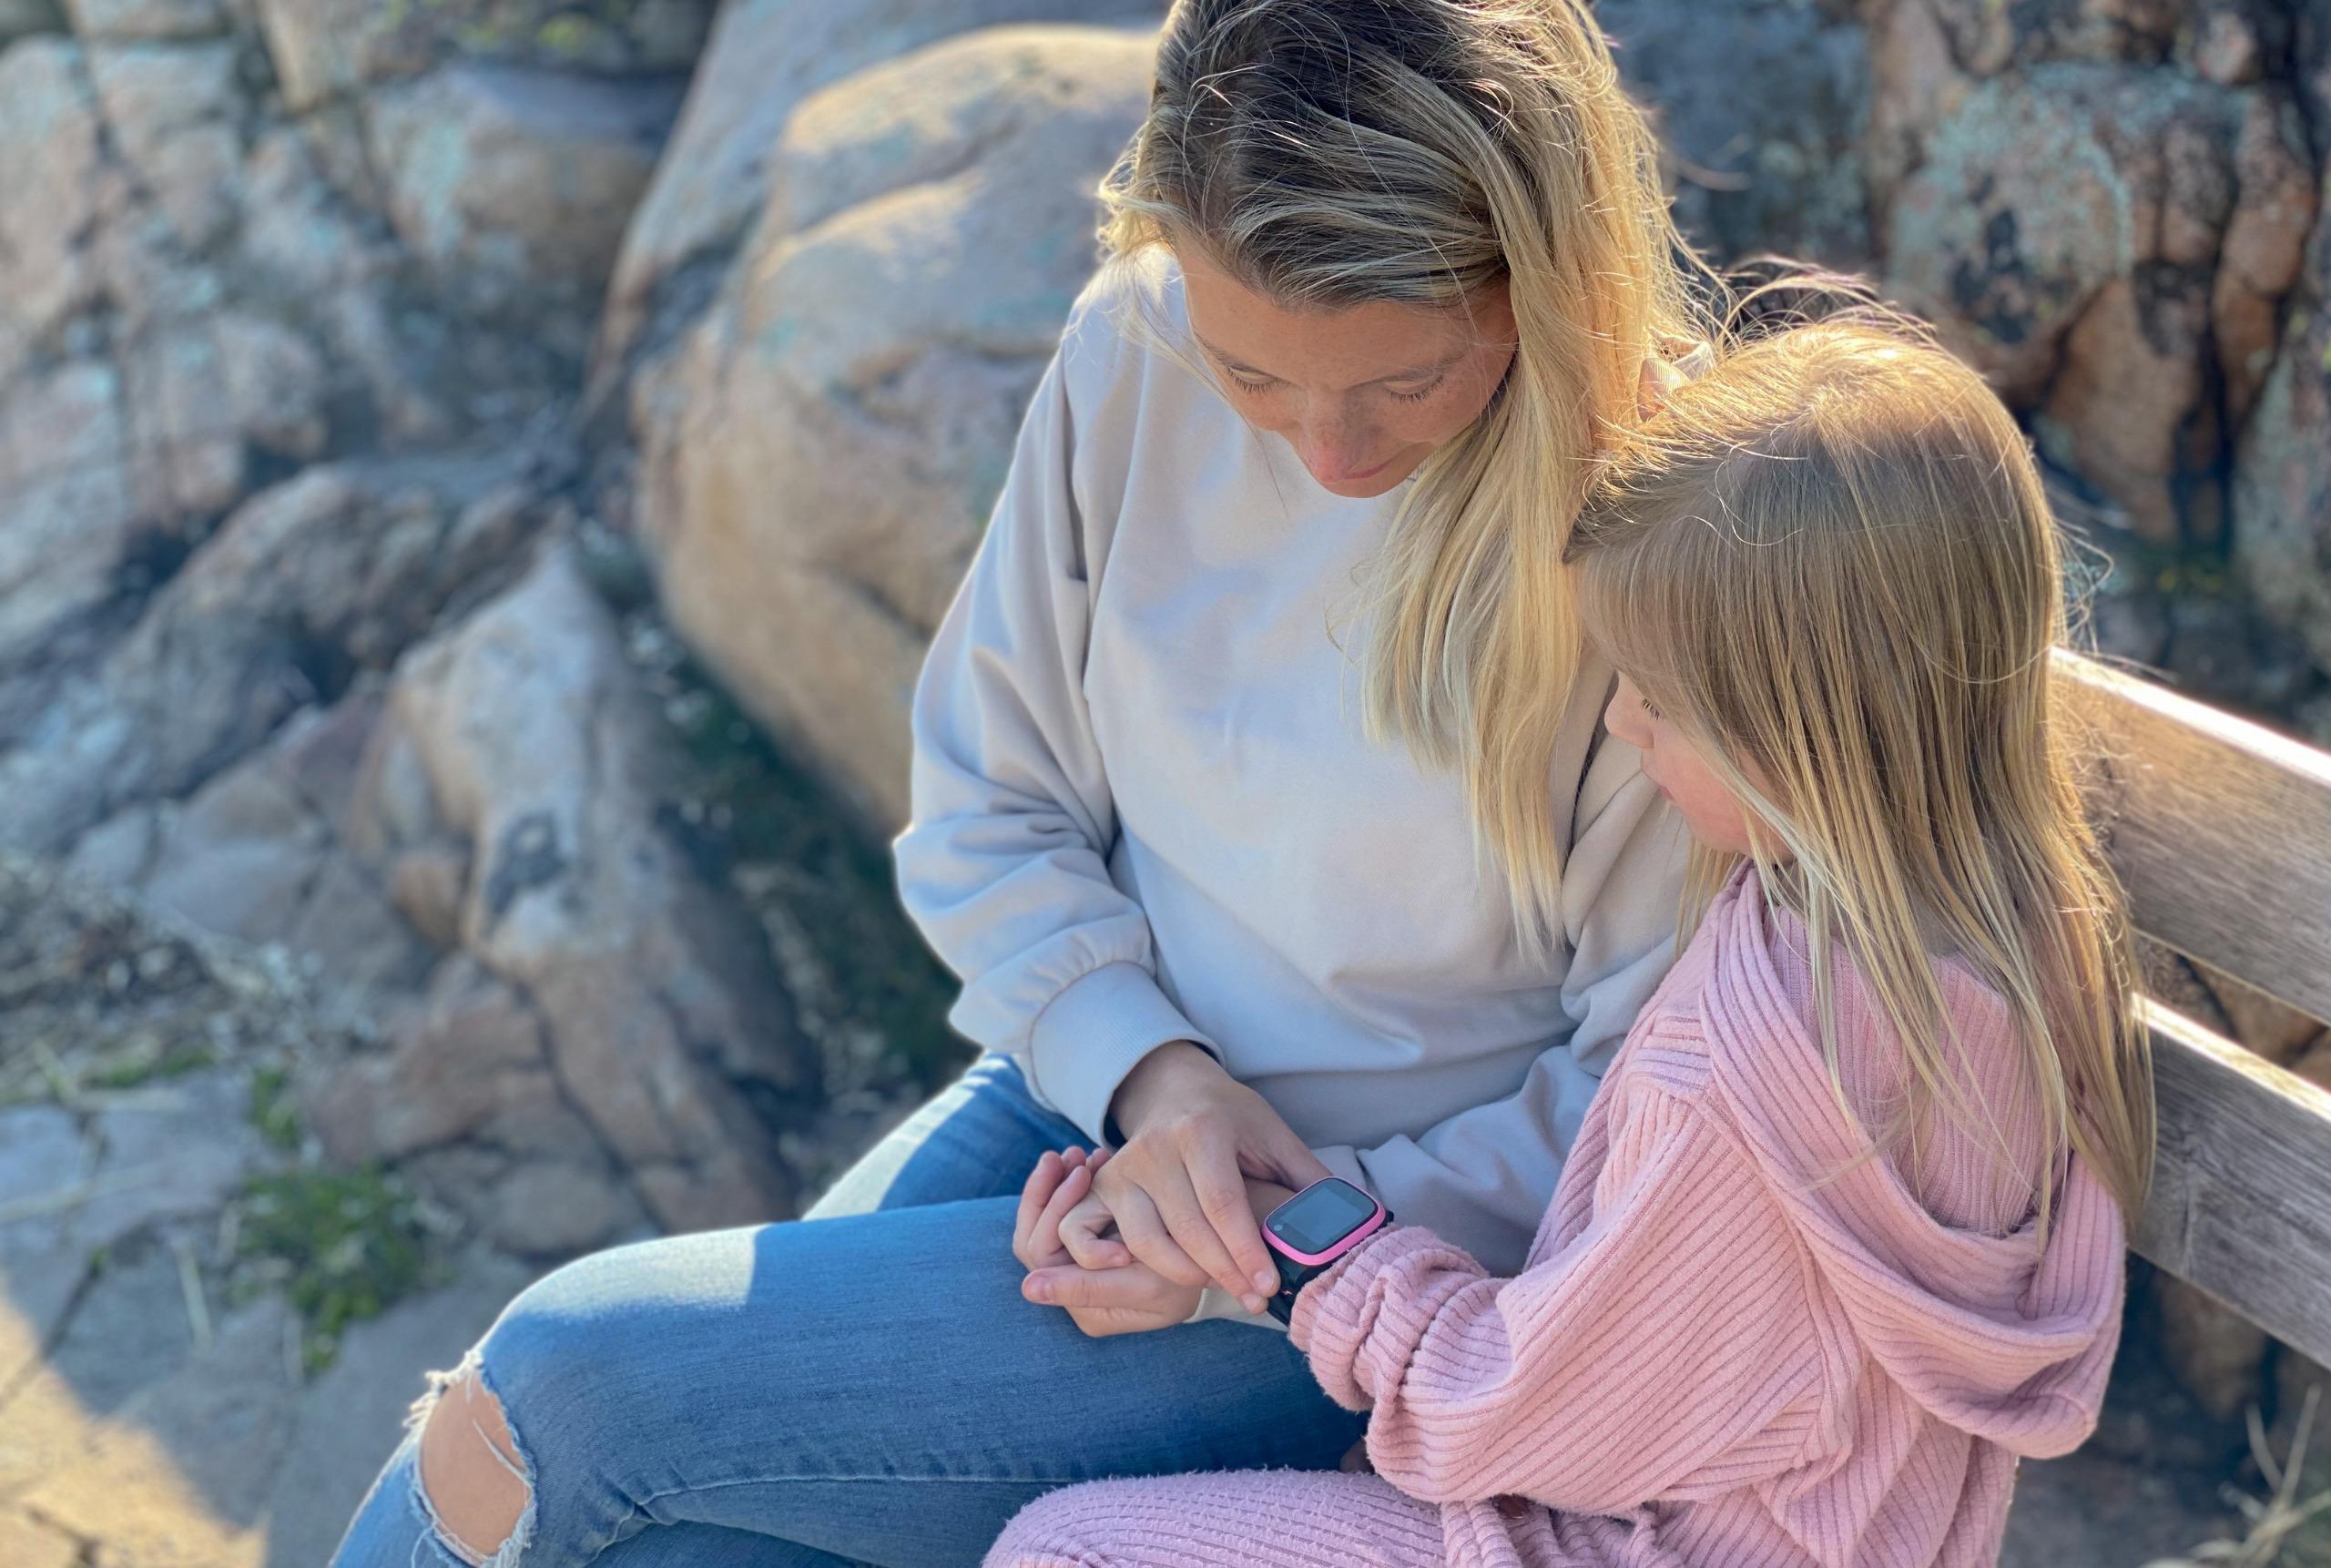 Netikette? – 5 råd til barnets møde med teknologi